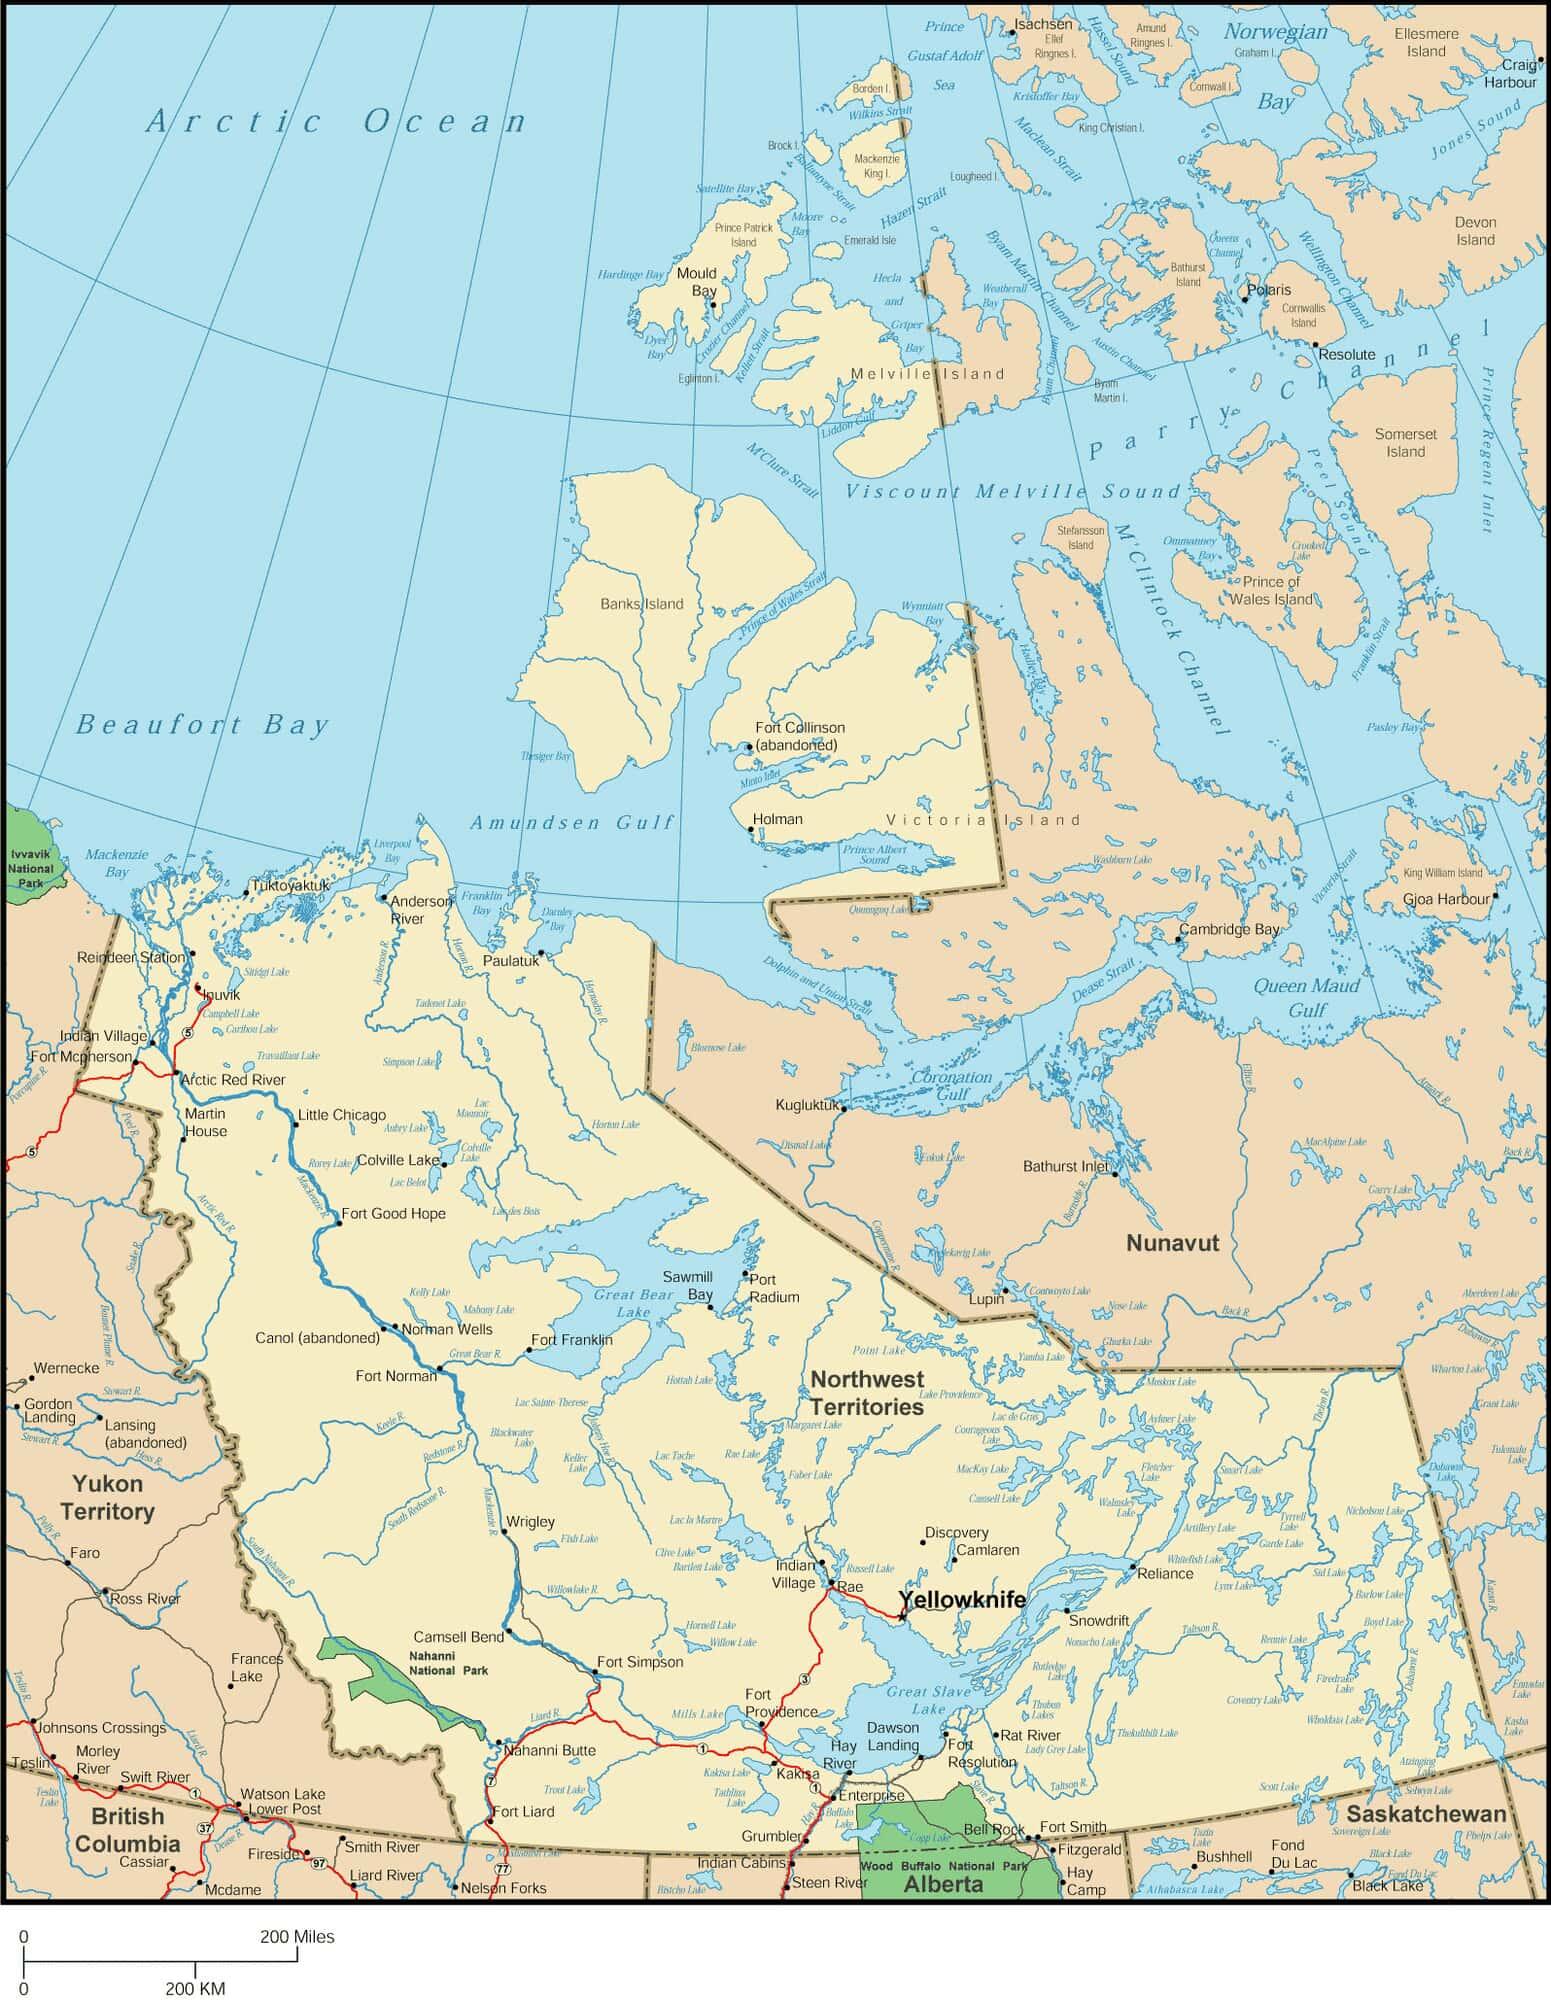 Northwest Territories Map - Map of Northwest Territories